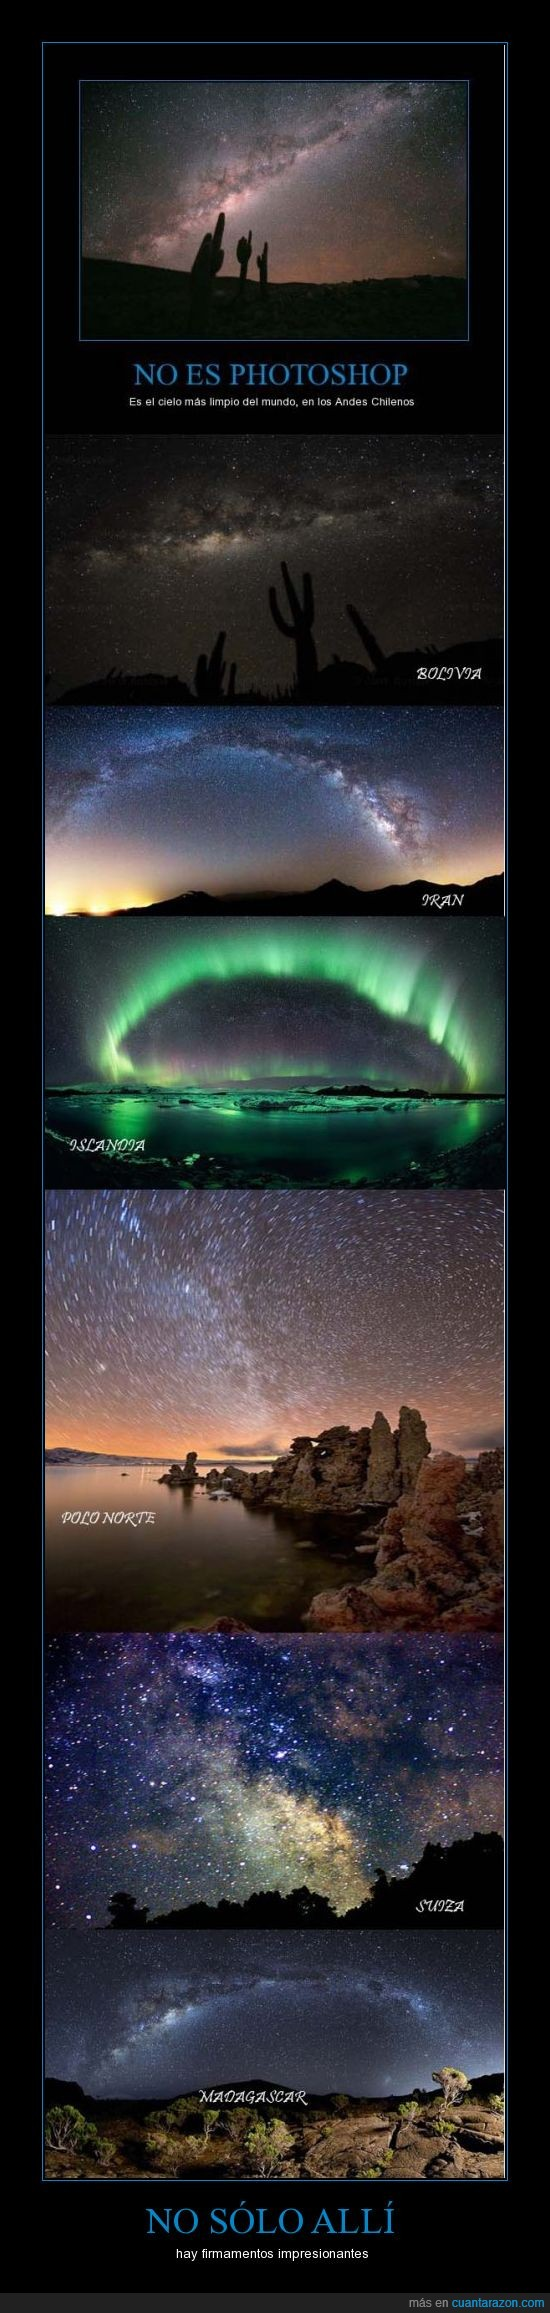 bolivia,del mundo,firmamentos,hermosos,iran,islandia,madagascar,photoshop,polo norte,suiza